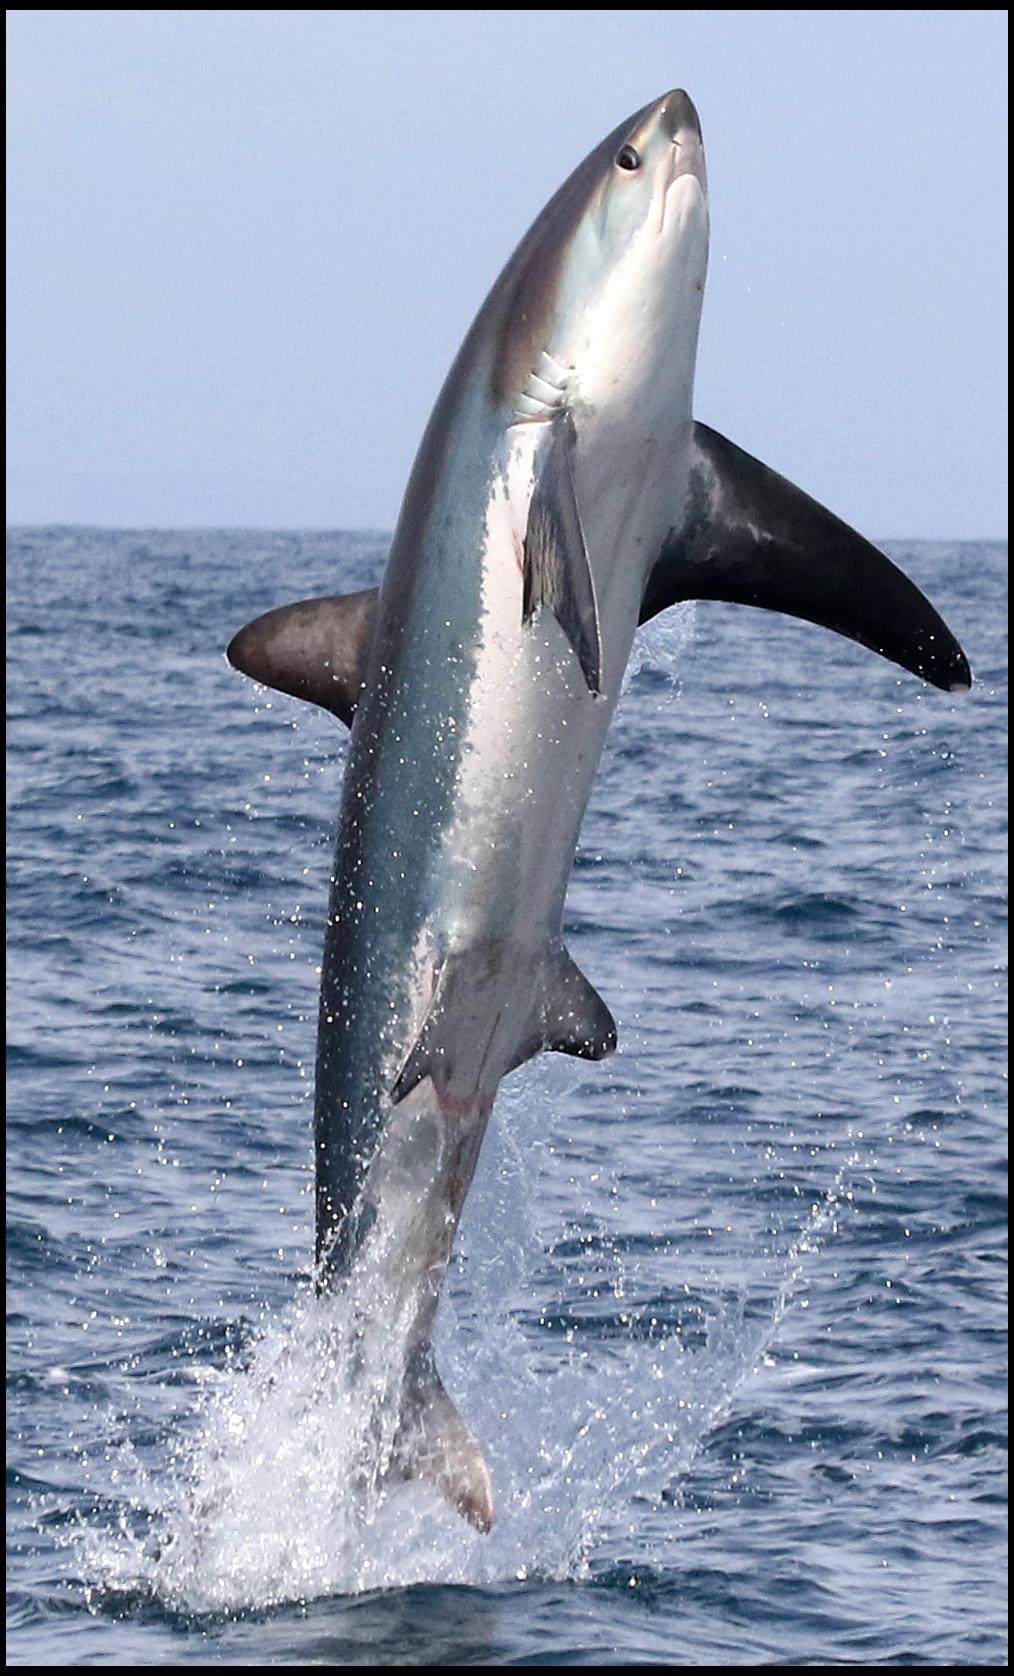 Shark bus speed dating